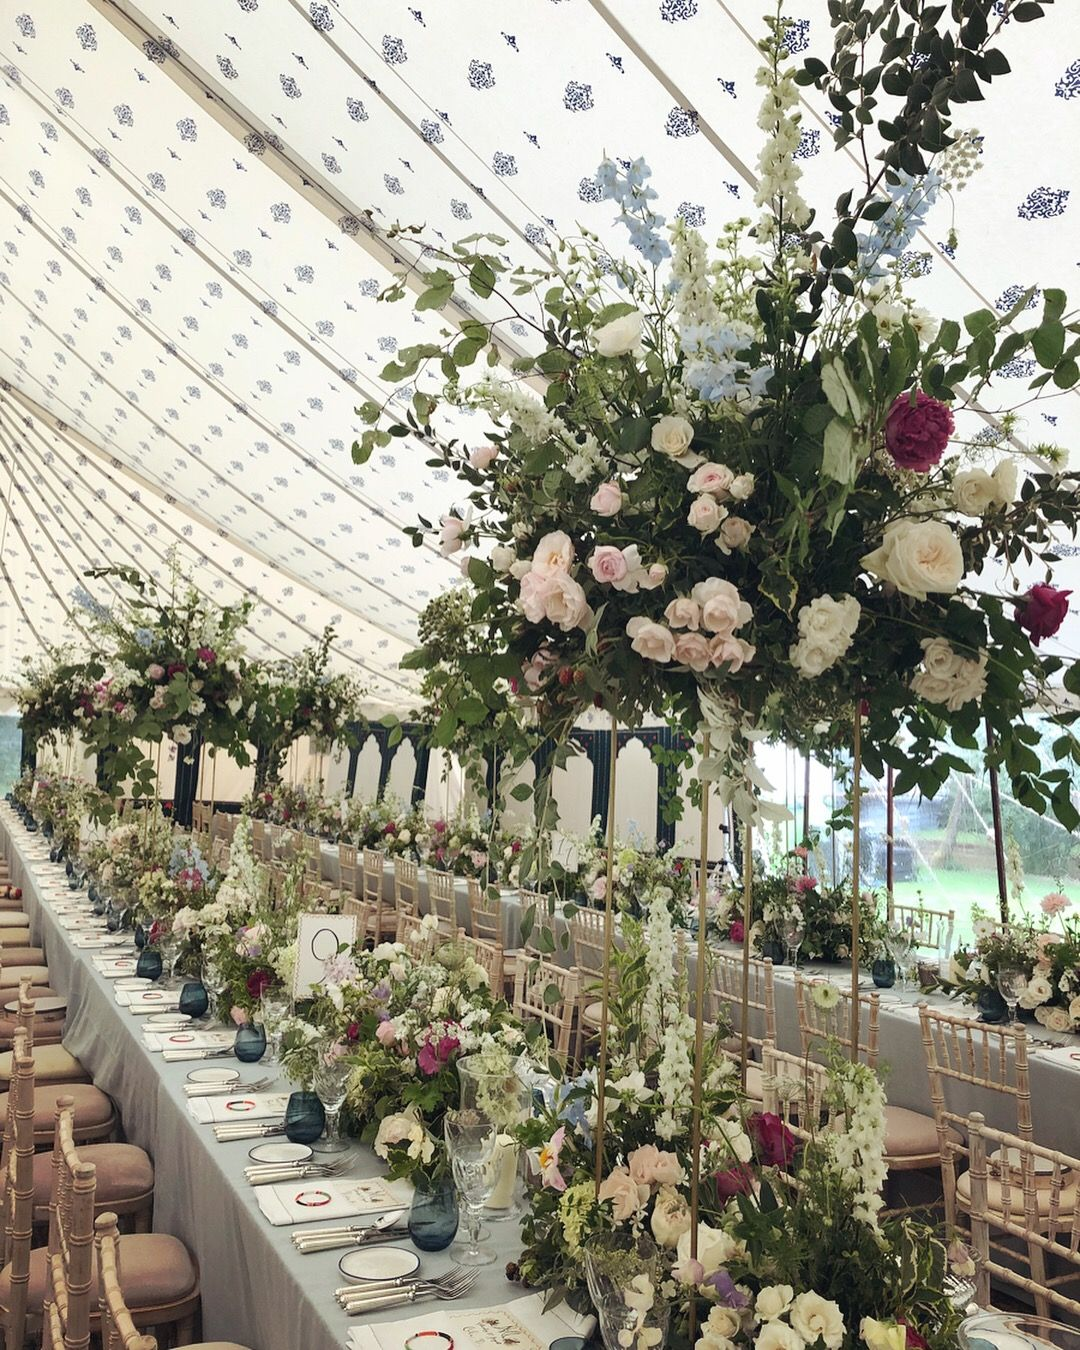 Summer Wedding Cornwell Manor Willow Crossley flowers